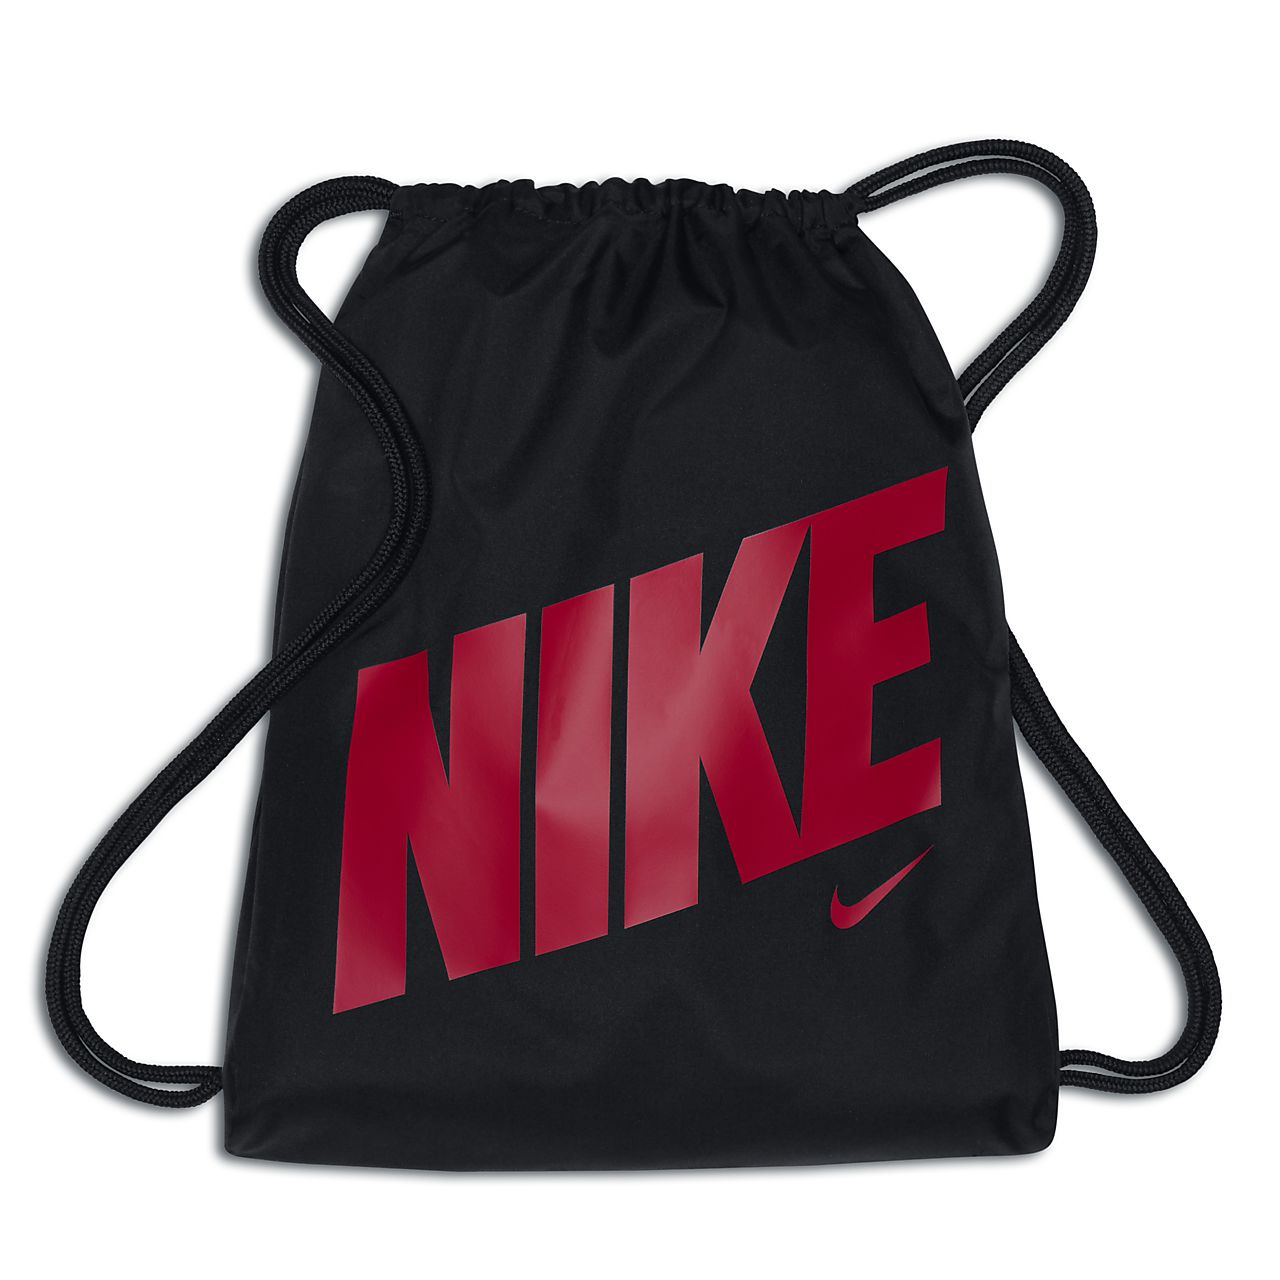 ab51a1faf49fe Nike Graphic Kids  Gym Sack. Nike.com